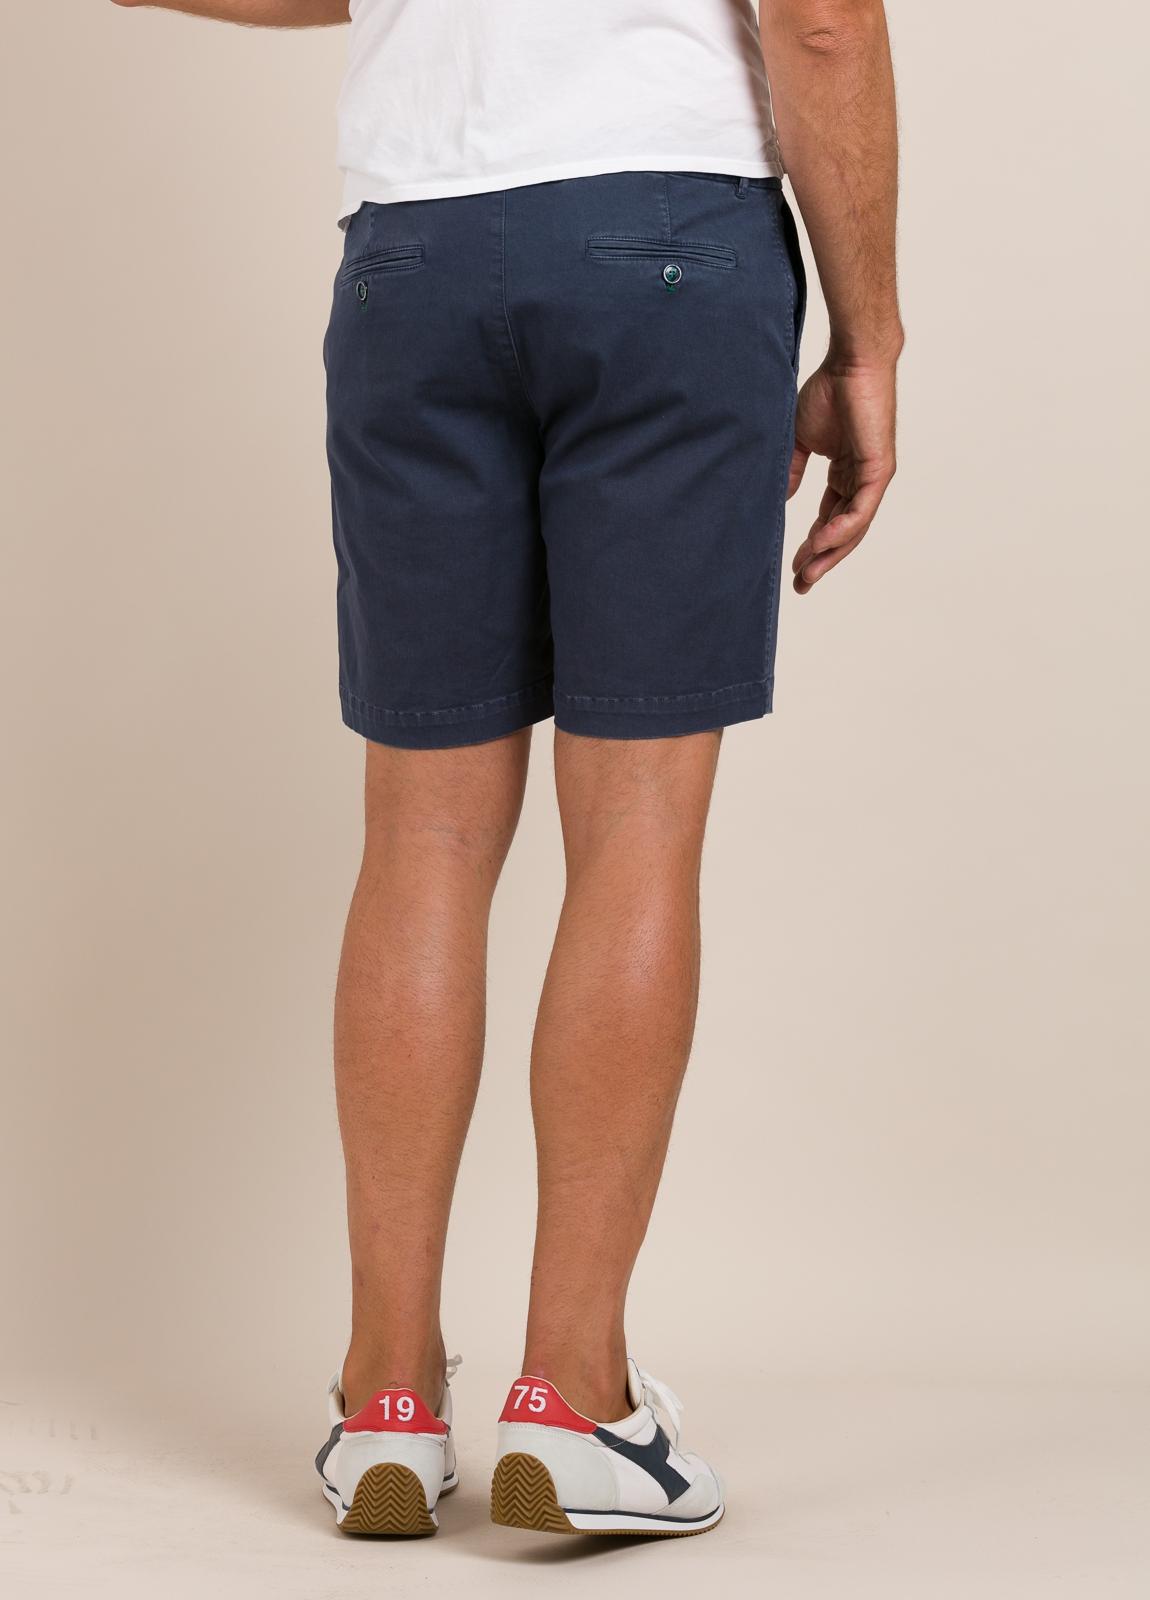 Bermuda modelo THOMAS color azul marino, 100% Algodón. - Ítem5